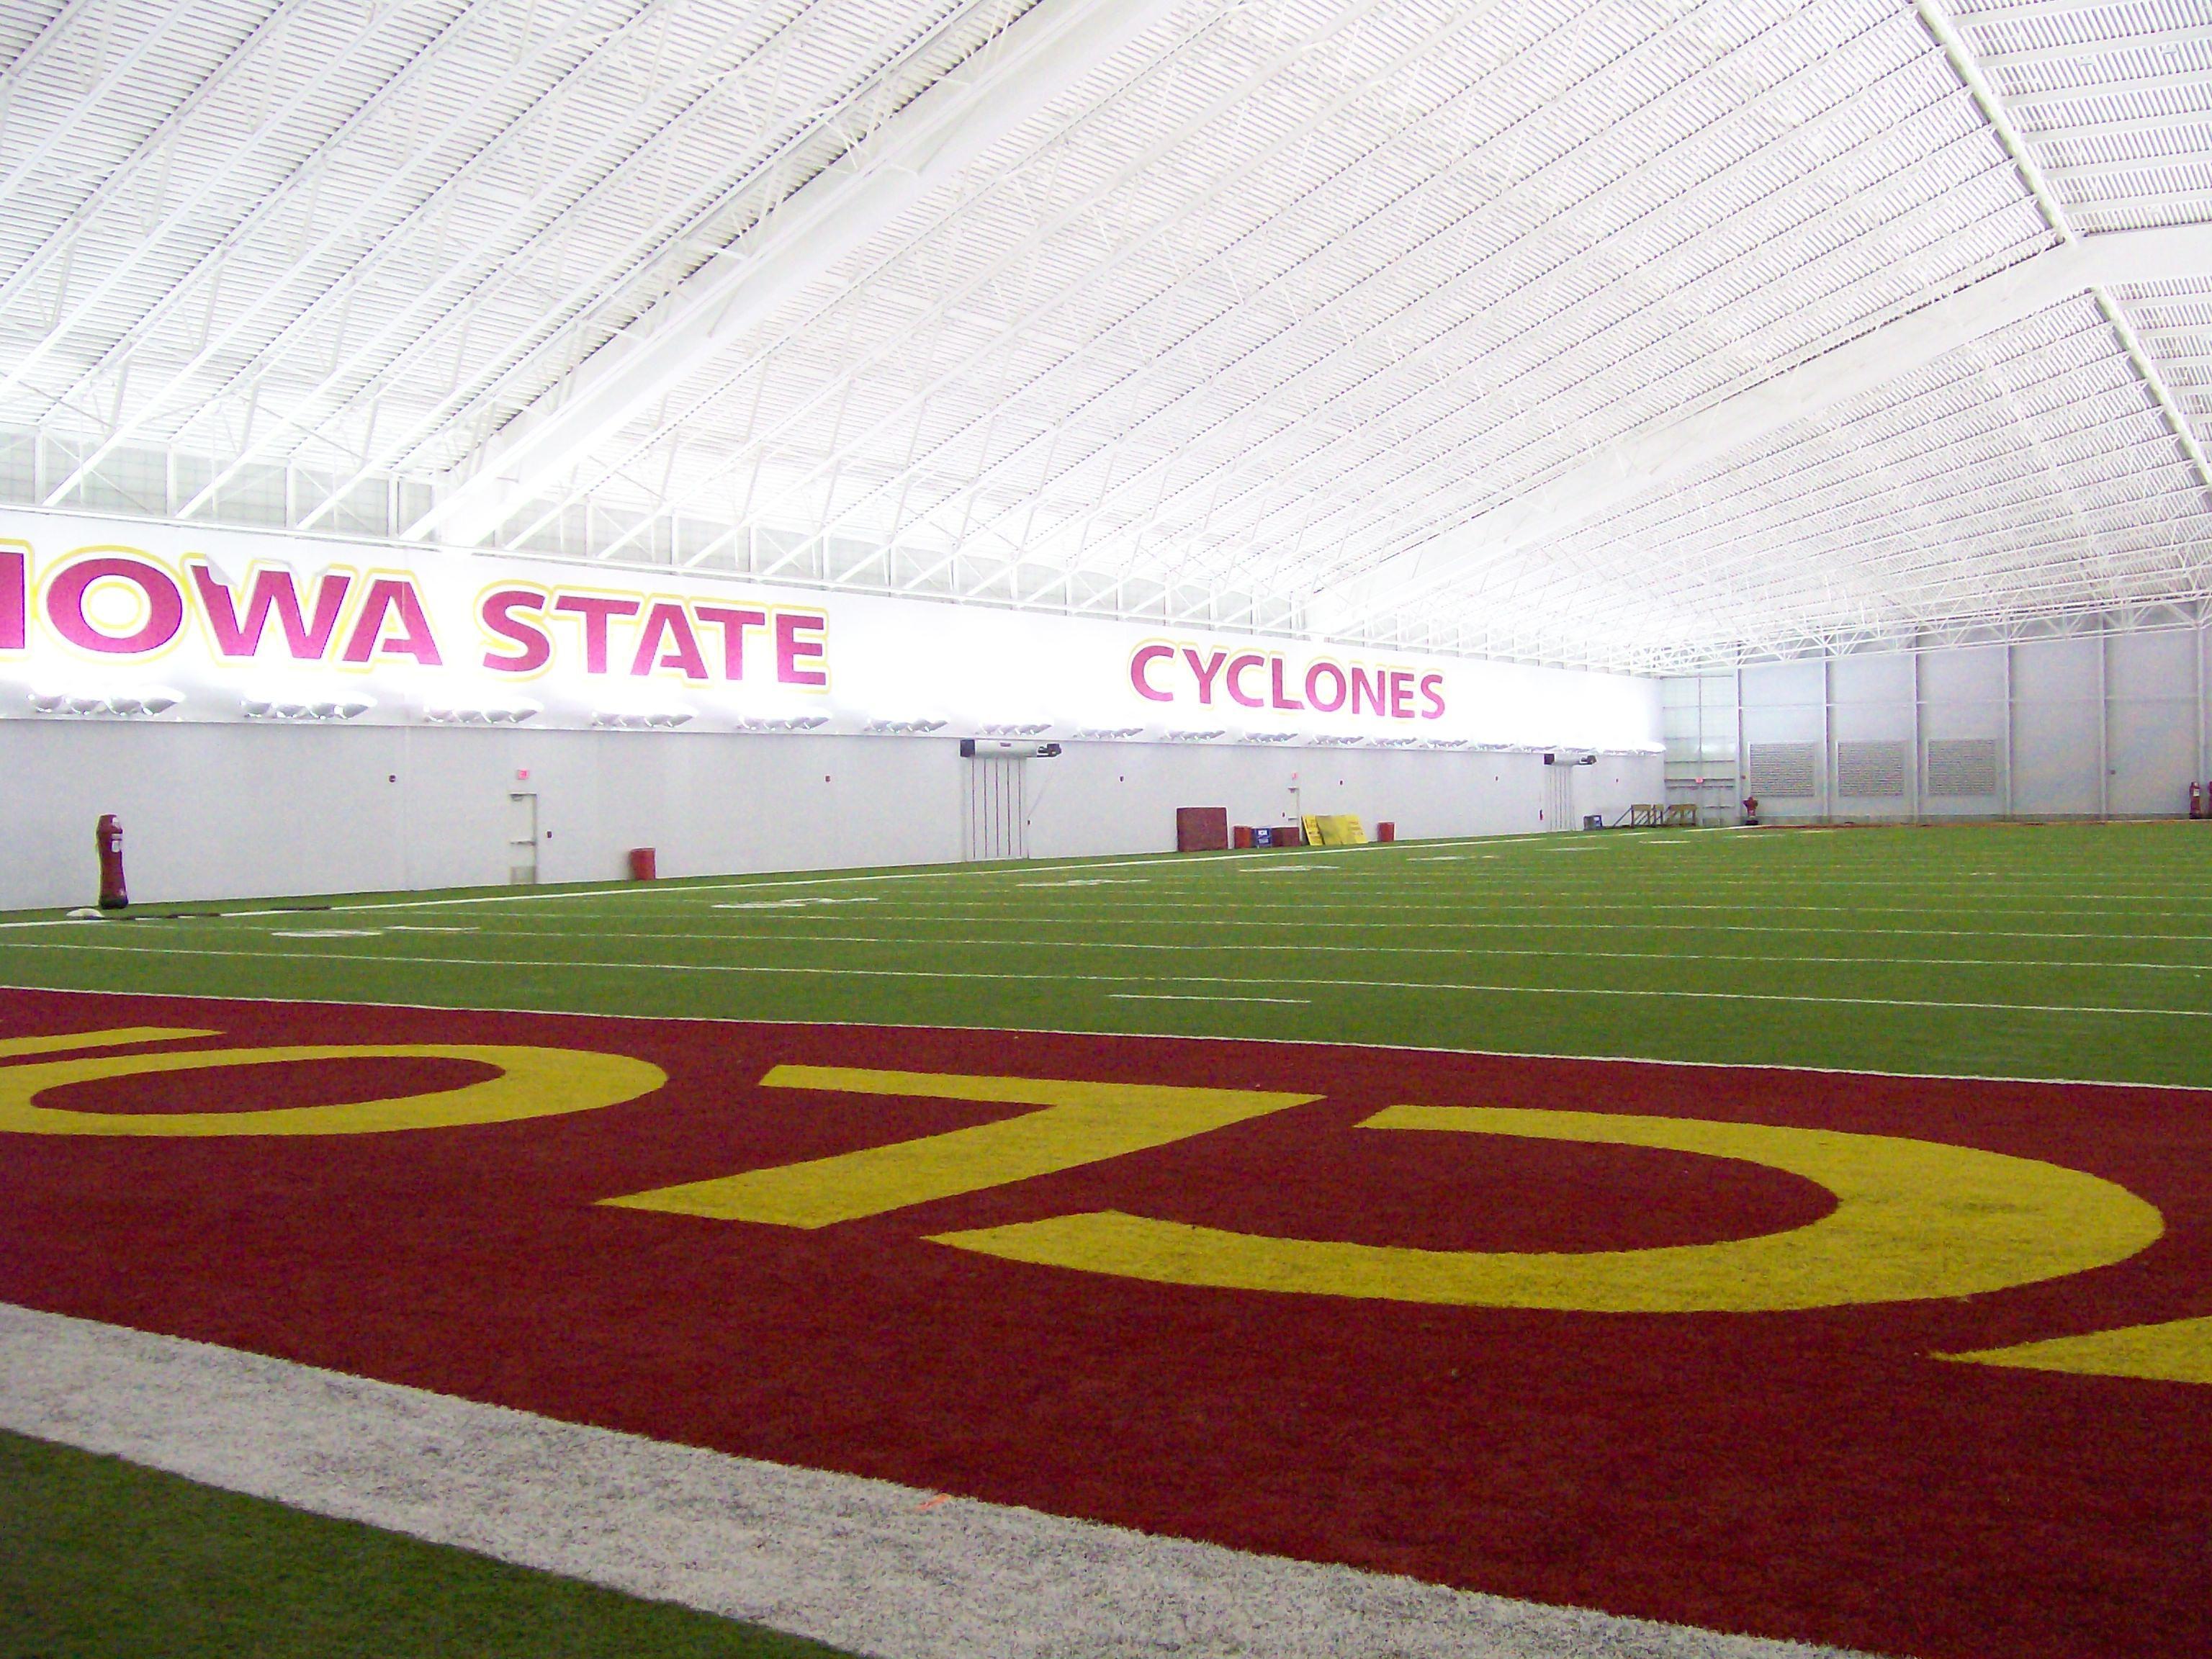 Iowa State Cyclones Footbal Team S Bergstrom Indoor Practice Facility Iowa State Cyclones Football Iowa State Football Iowa State